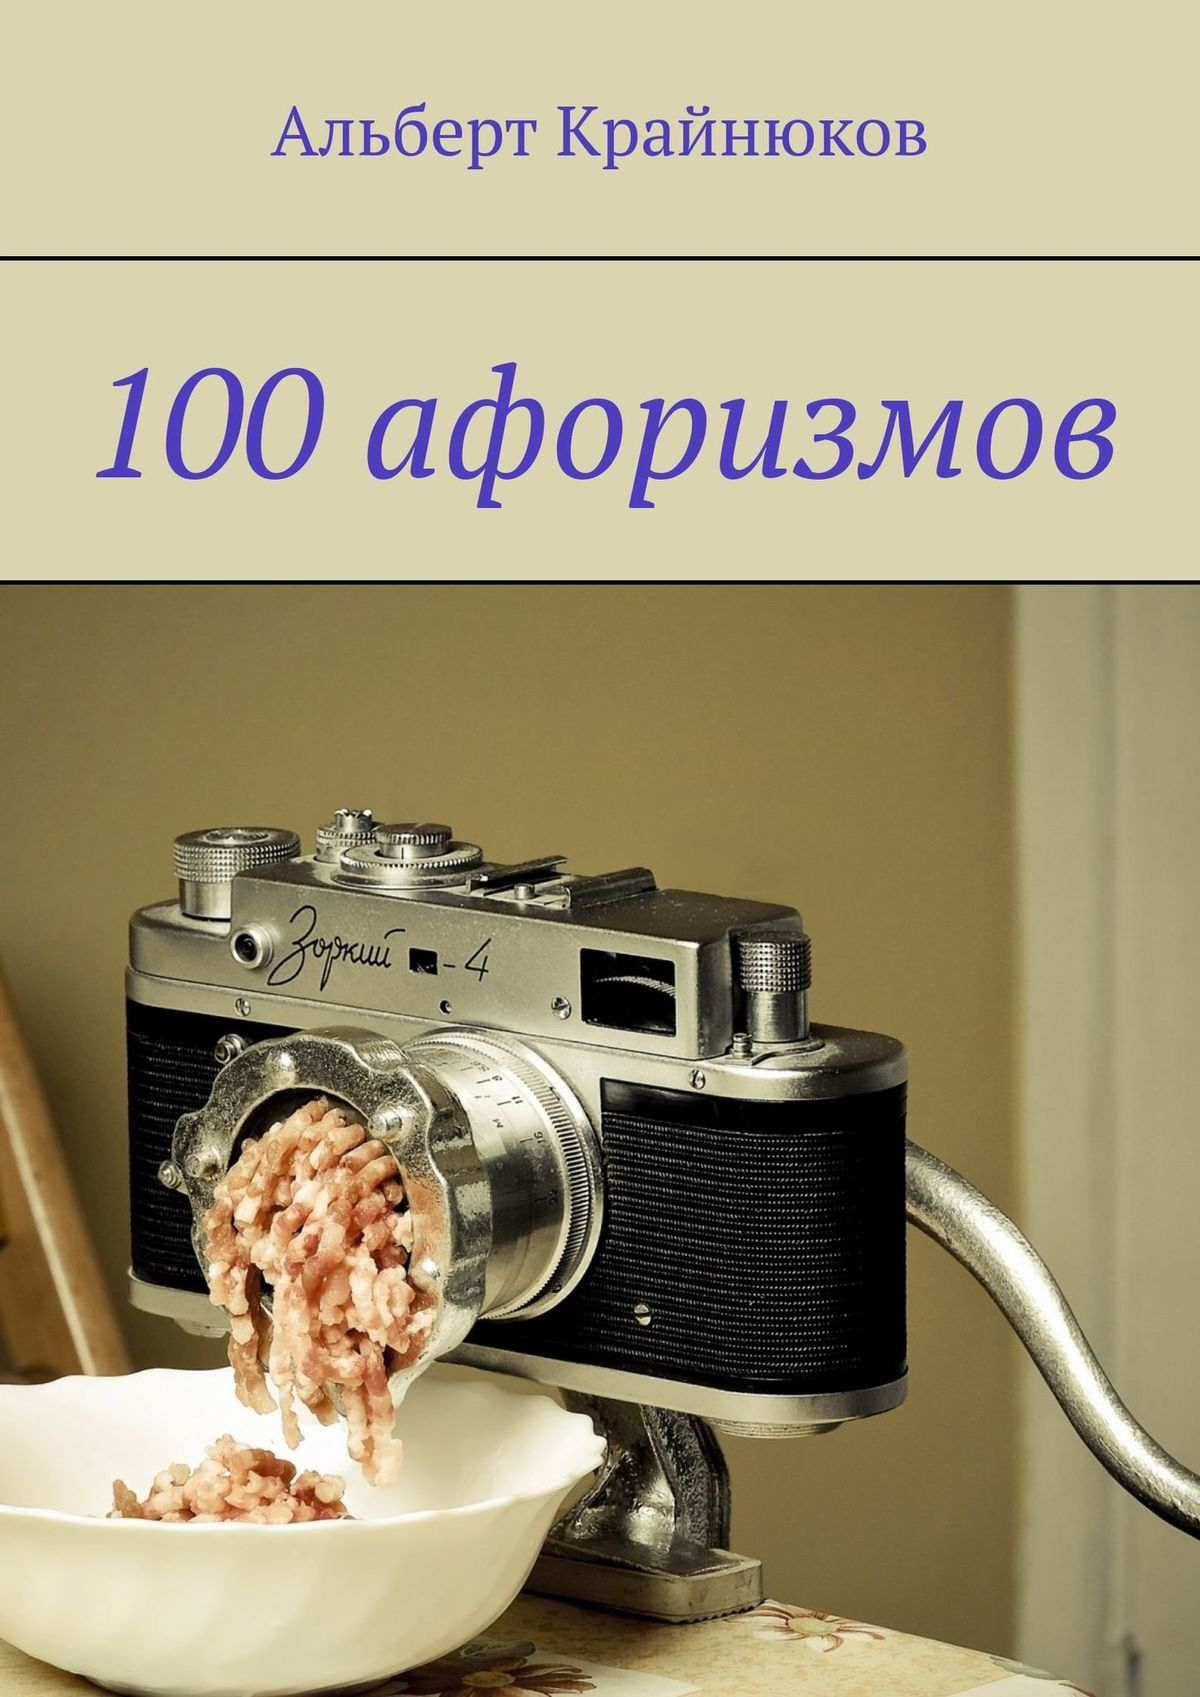 100 афоризмов